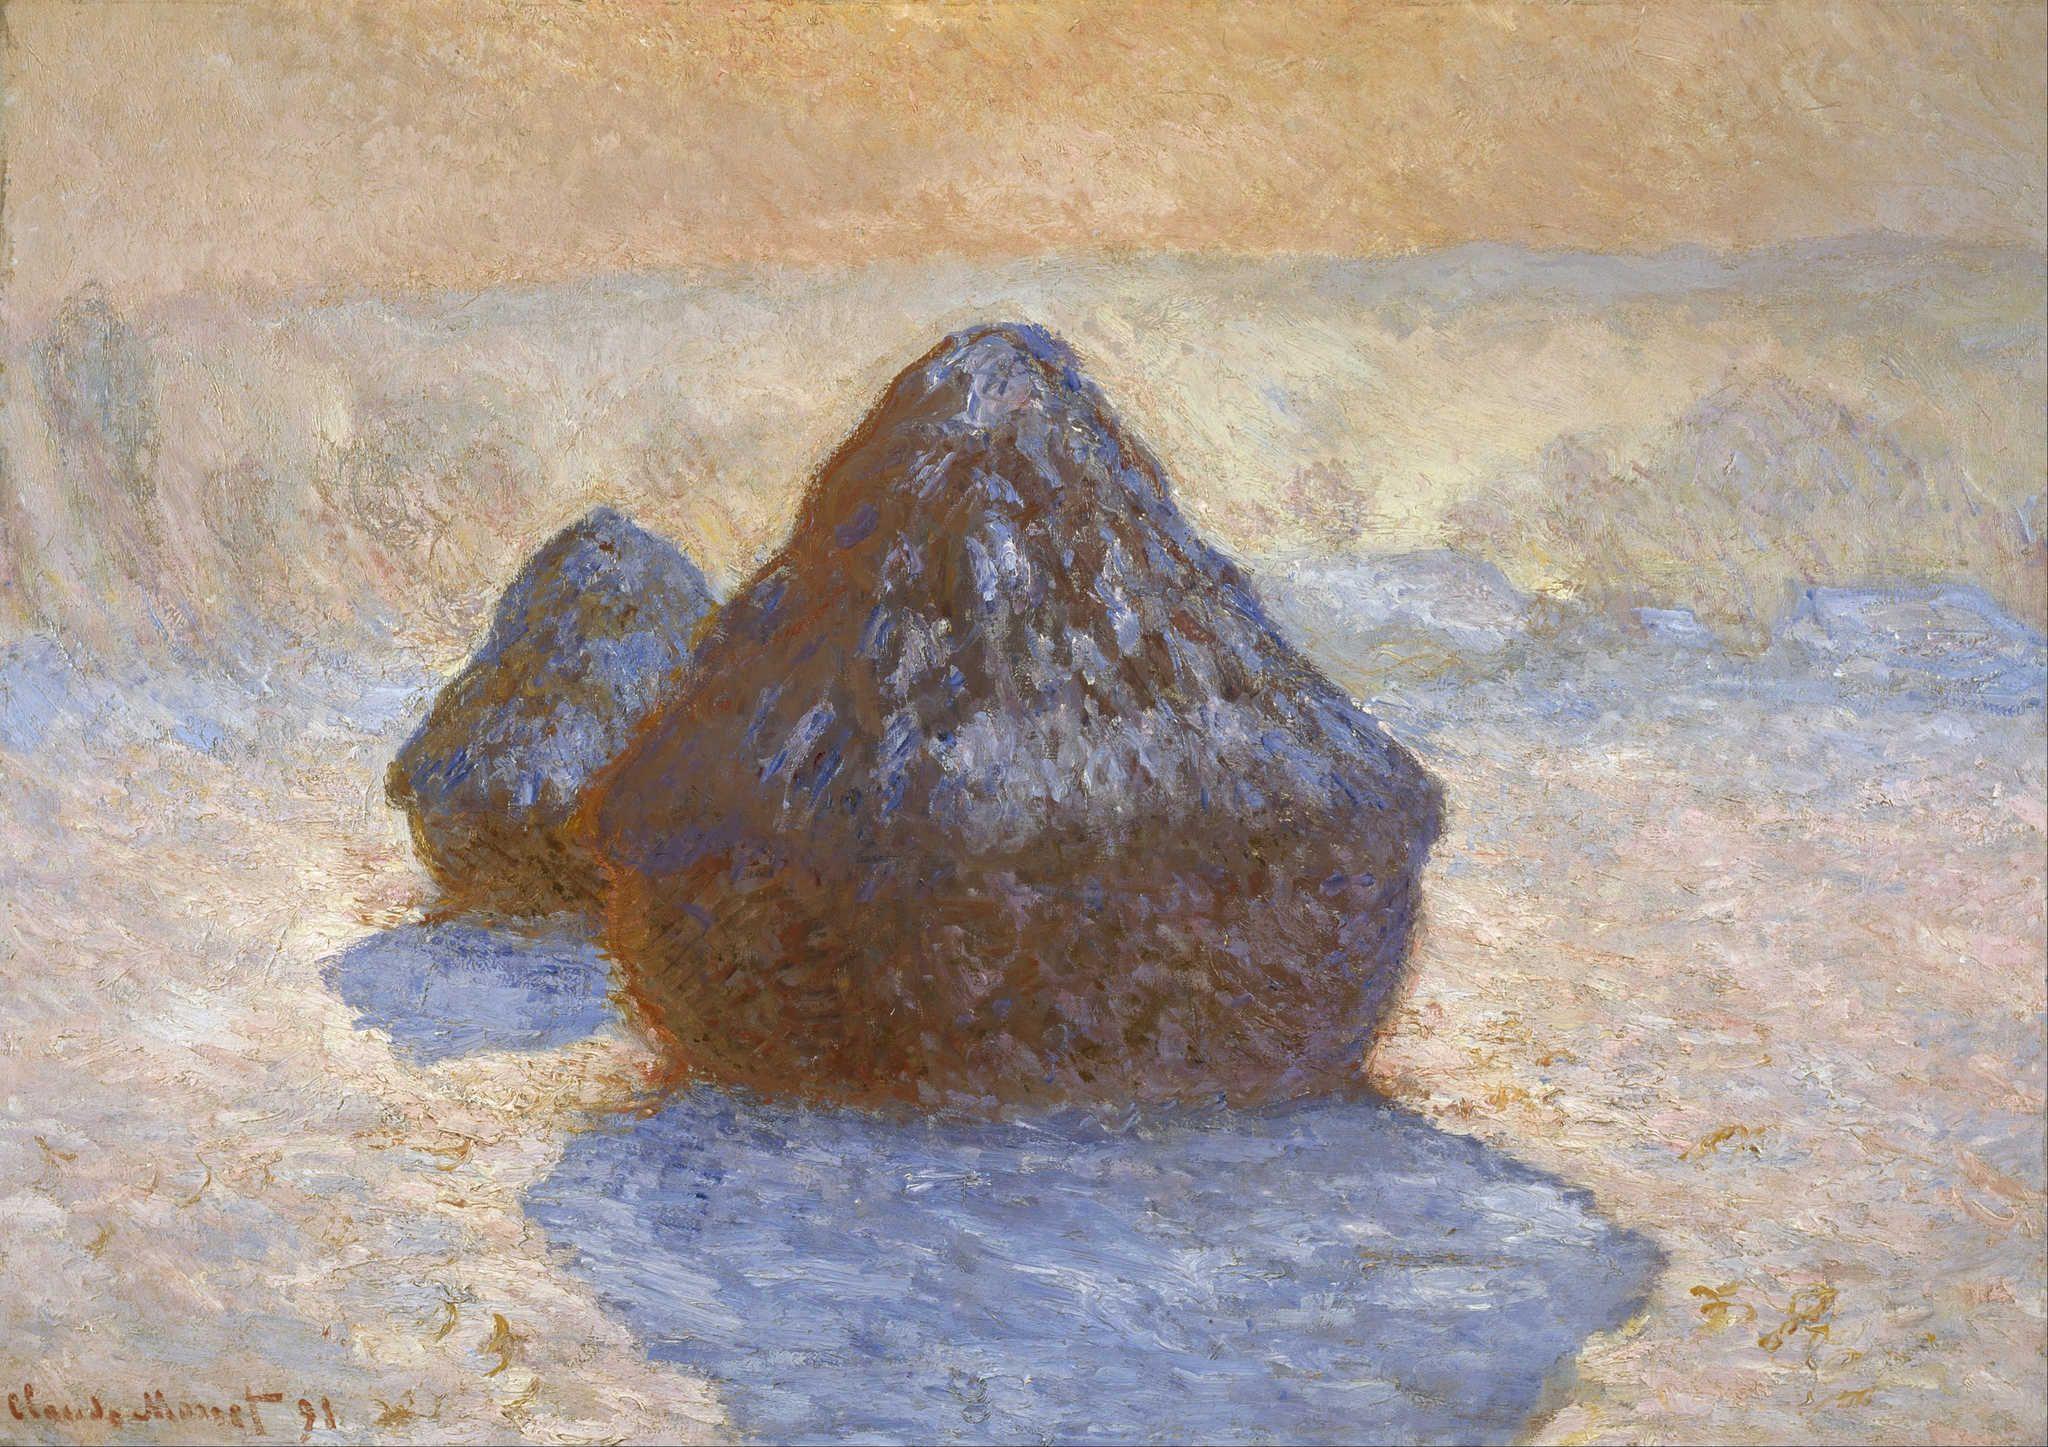 Claude Monet: Haystacks, Snow Effect, 1891 | Monet, Impressionisme,  Kunstgeschiedenis